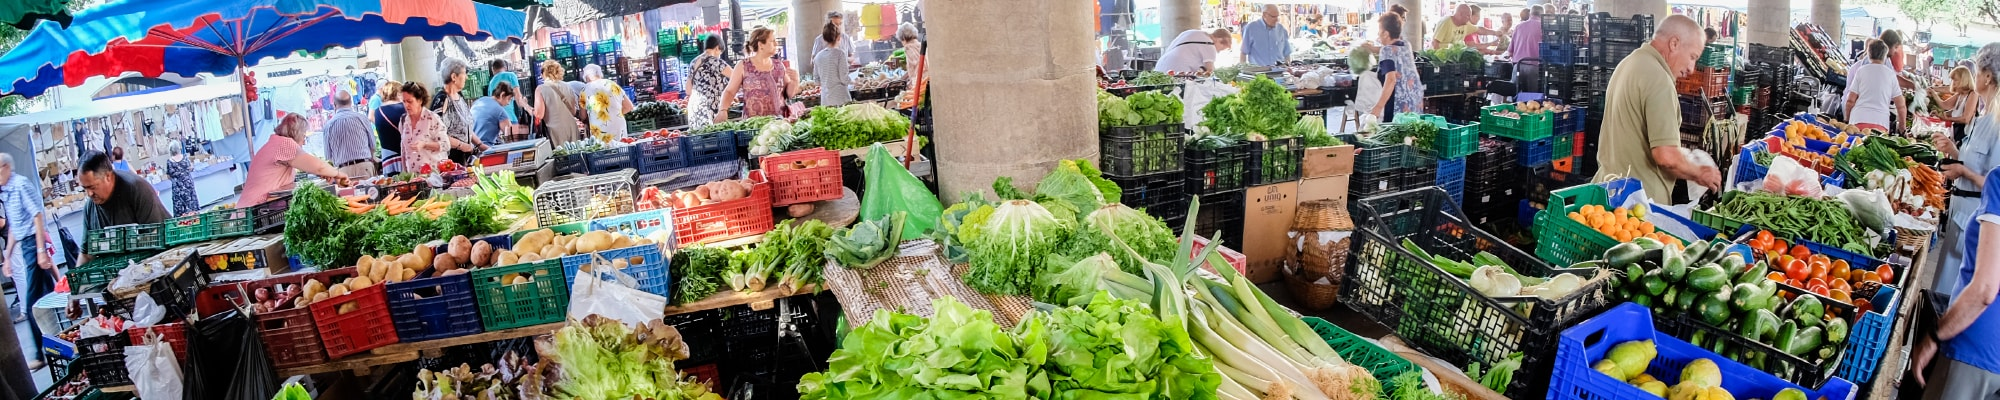 mercado-cabecera-min